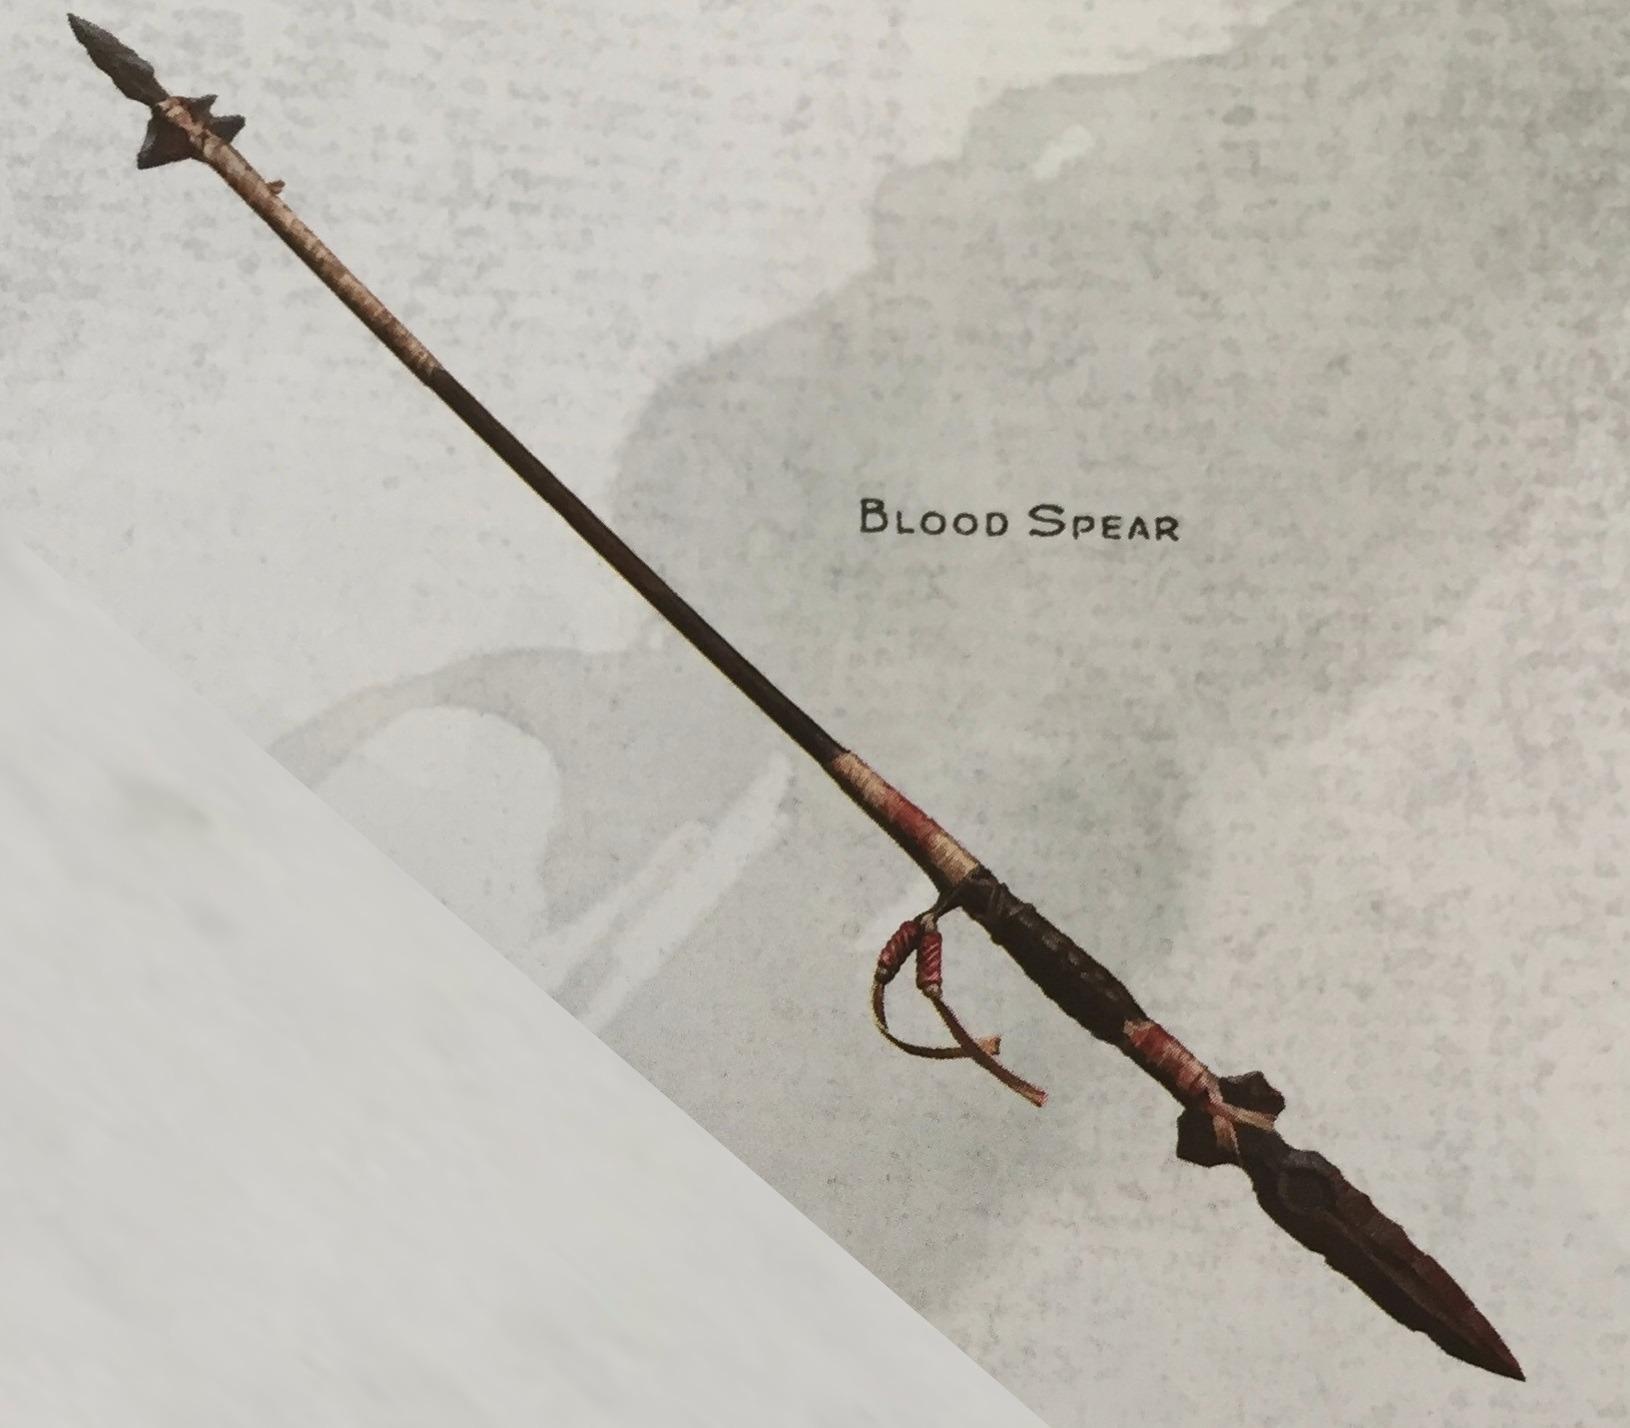 Blood Spear | Curse of Strahd | Obsidian Portal